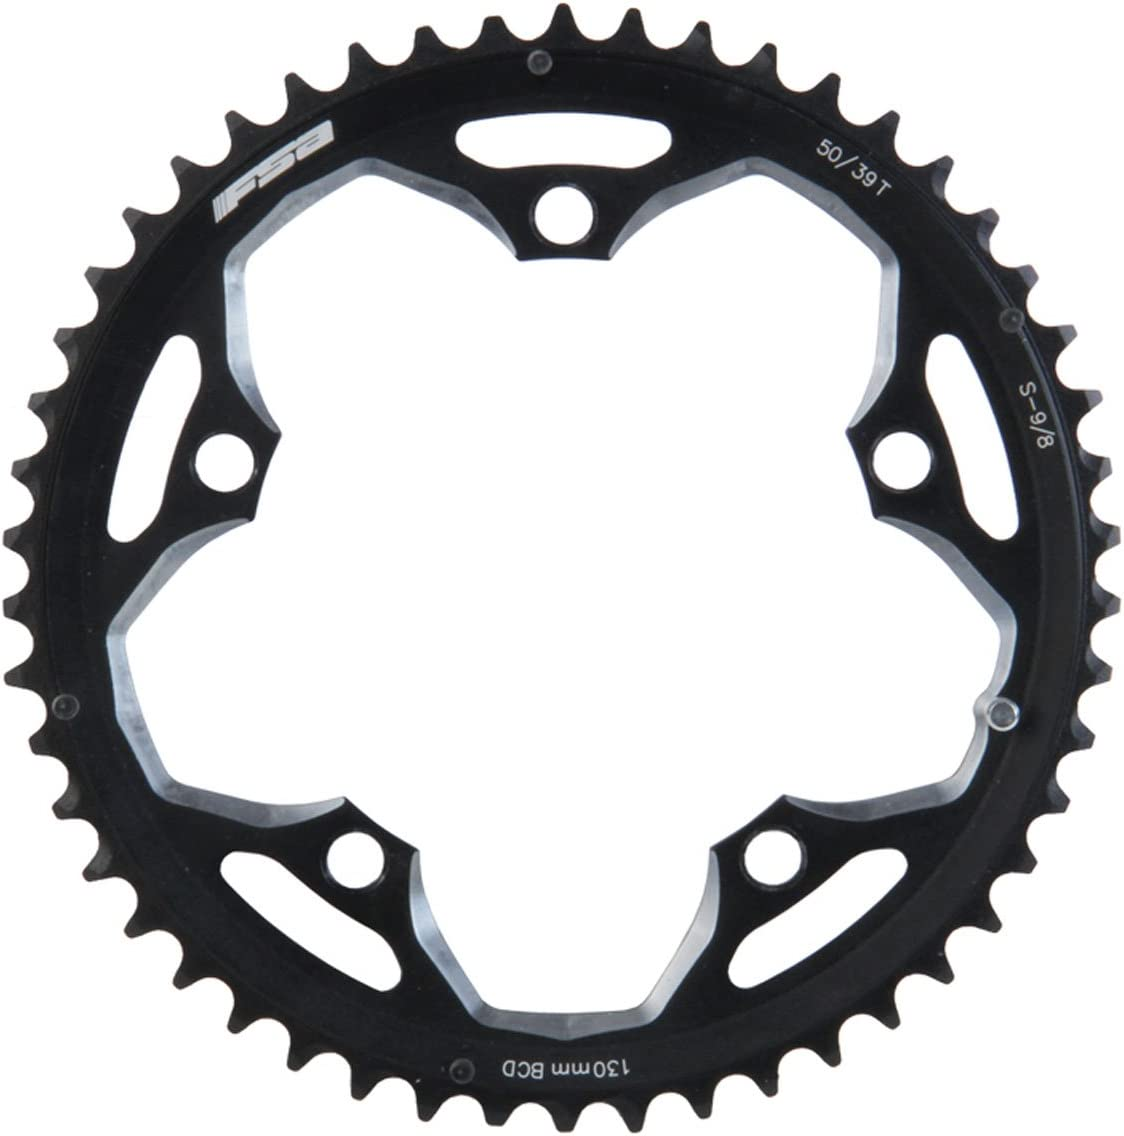 Full Speed Ahead Pro Vélo de Route Chainring N//11 130x53t Noir